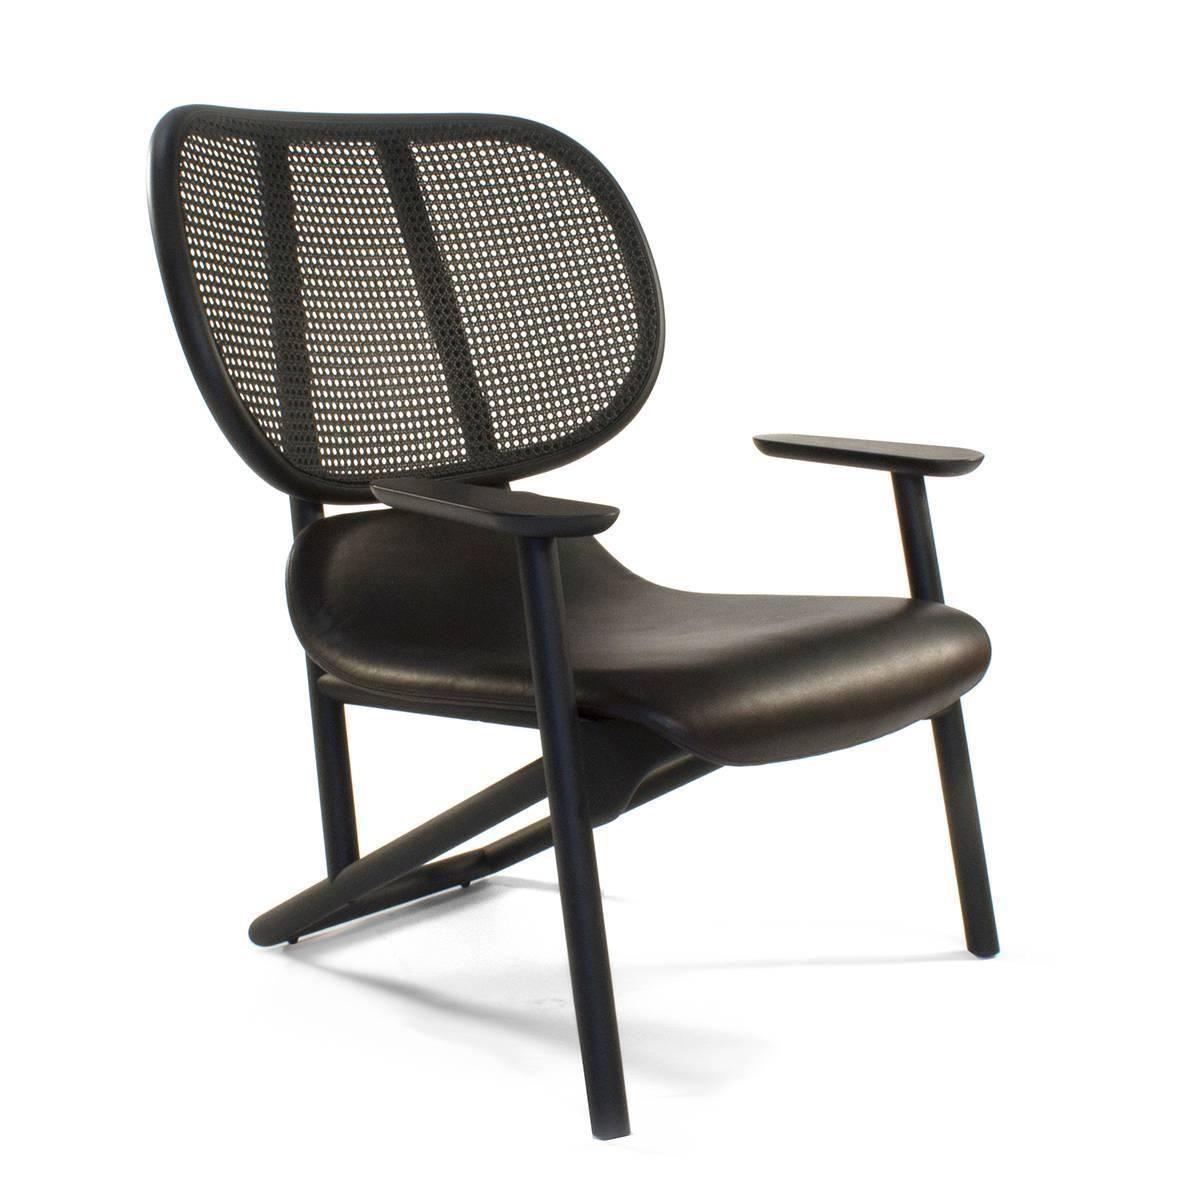 Moroso Black Klara Lounge Armchair by Patricia Urquiola